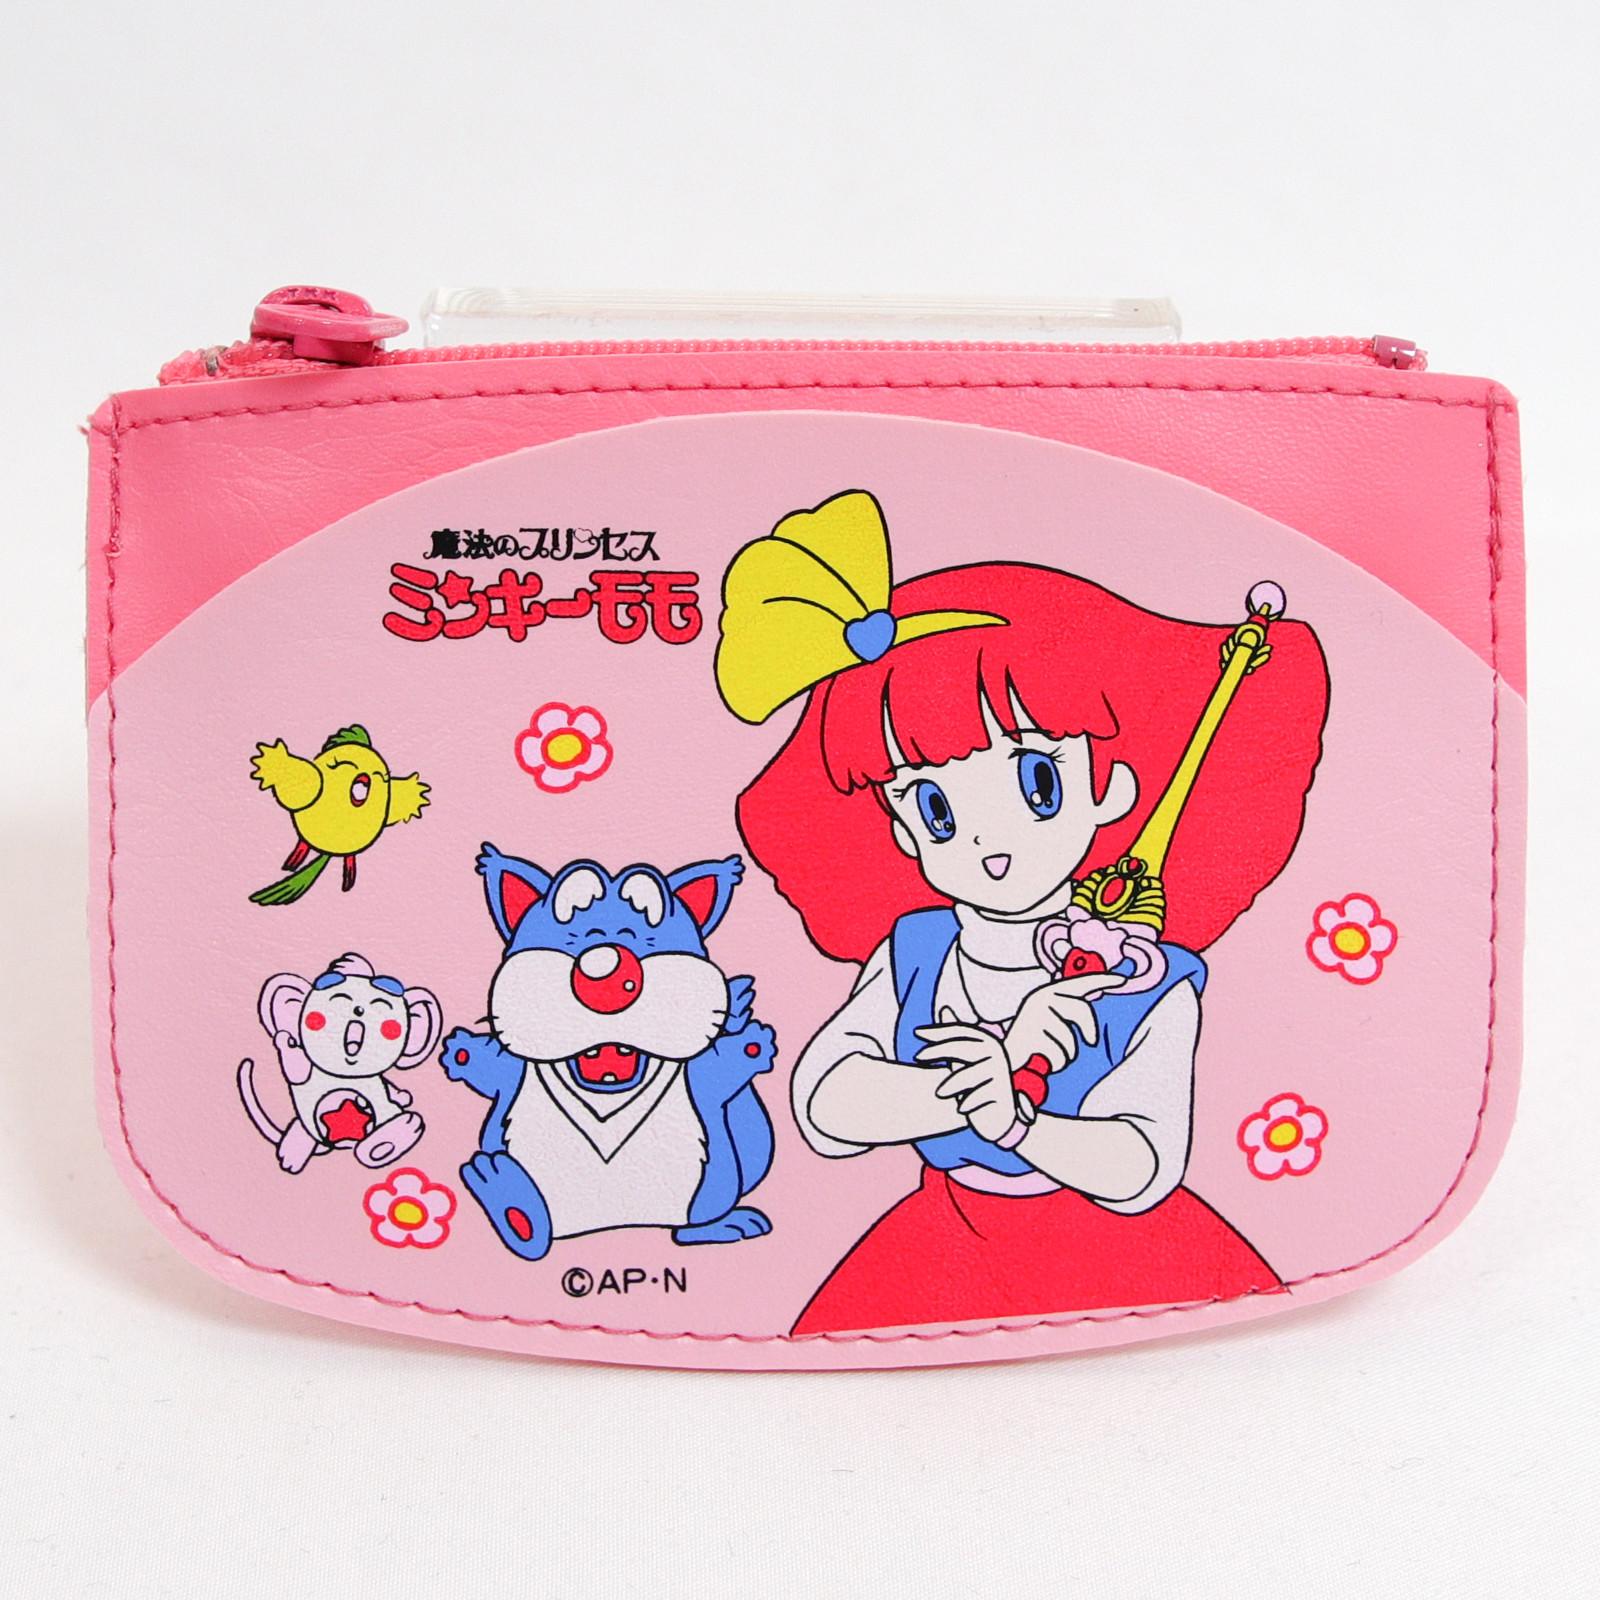 Magical Princess Minky Momo Purse Coin Case Pink ver. JAPAN ANIME